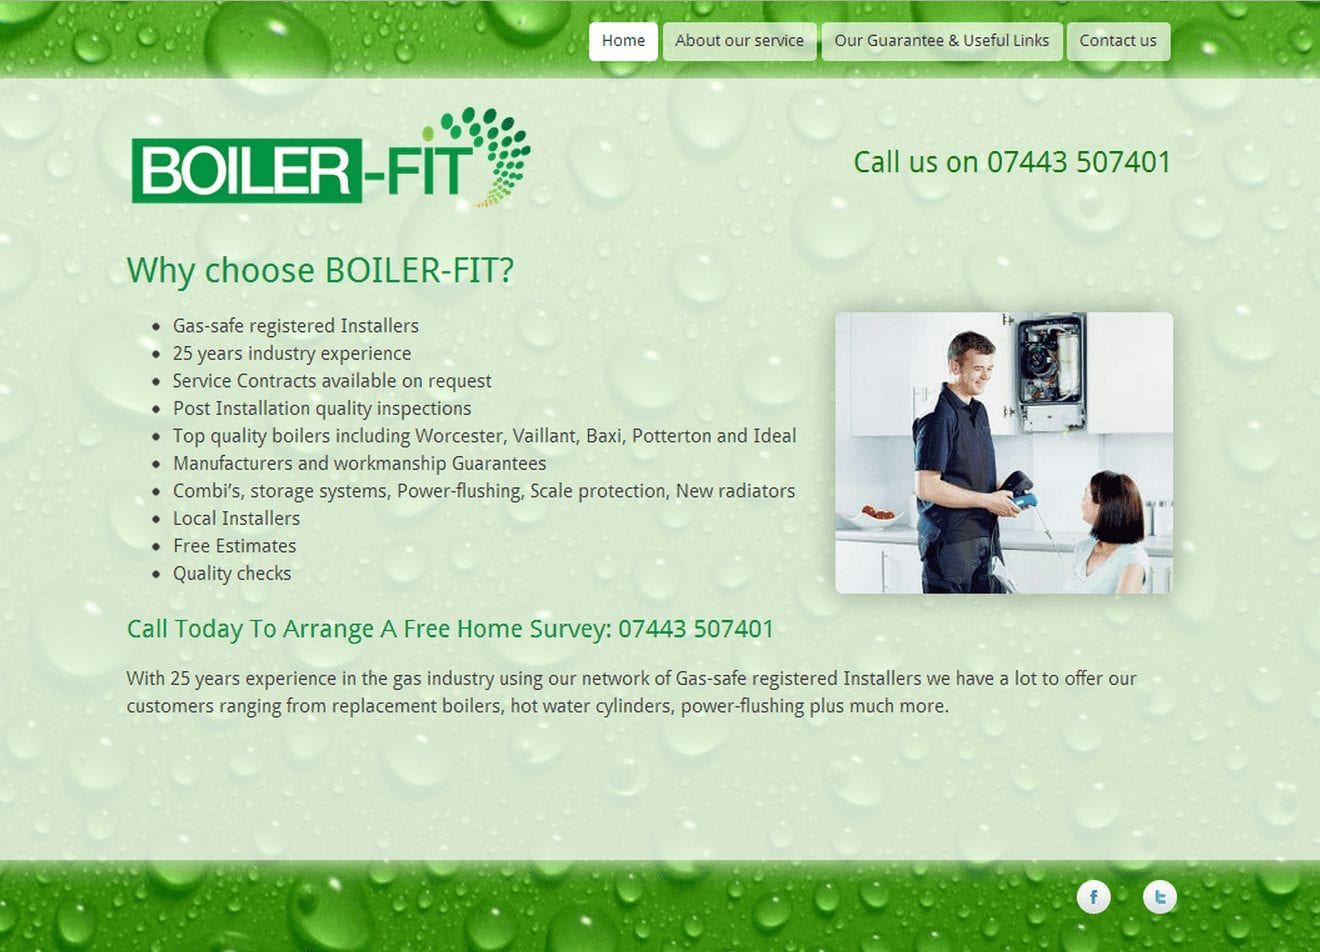 new-website-for-swindon-based-boiler-fit.png